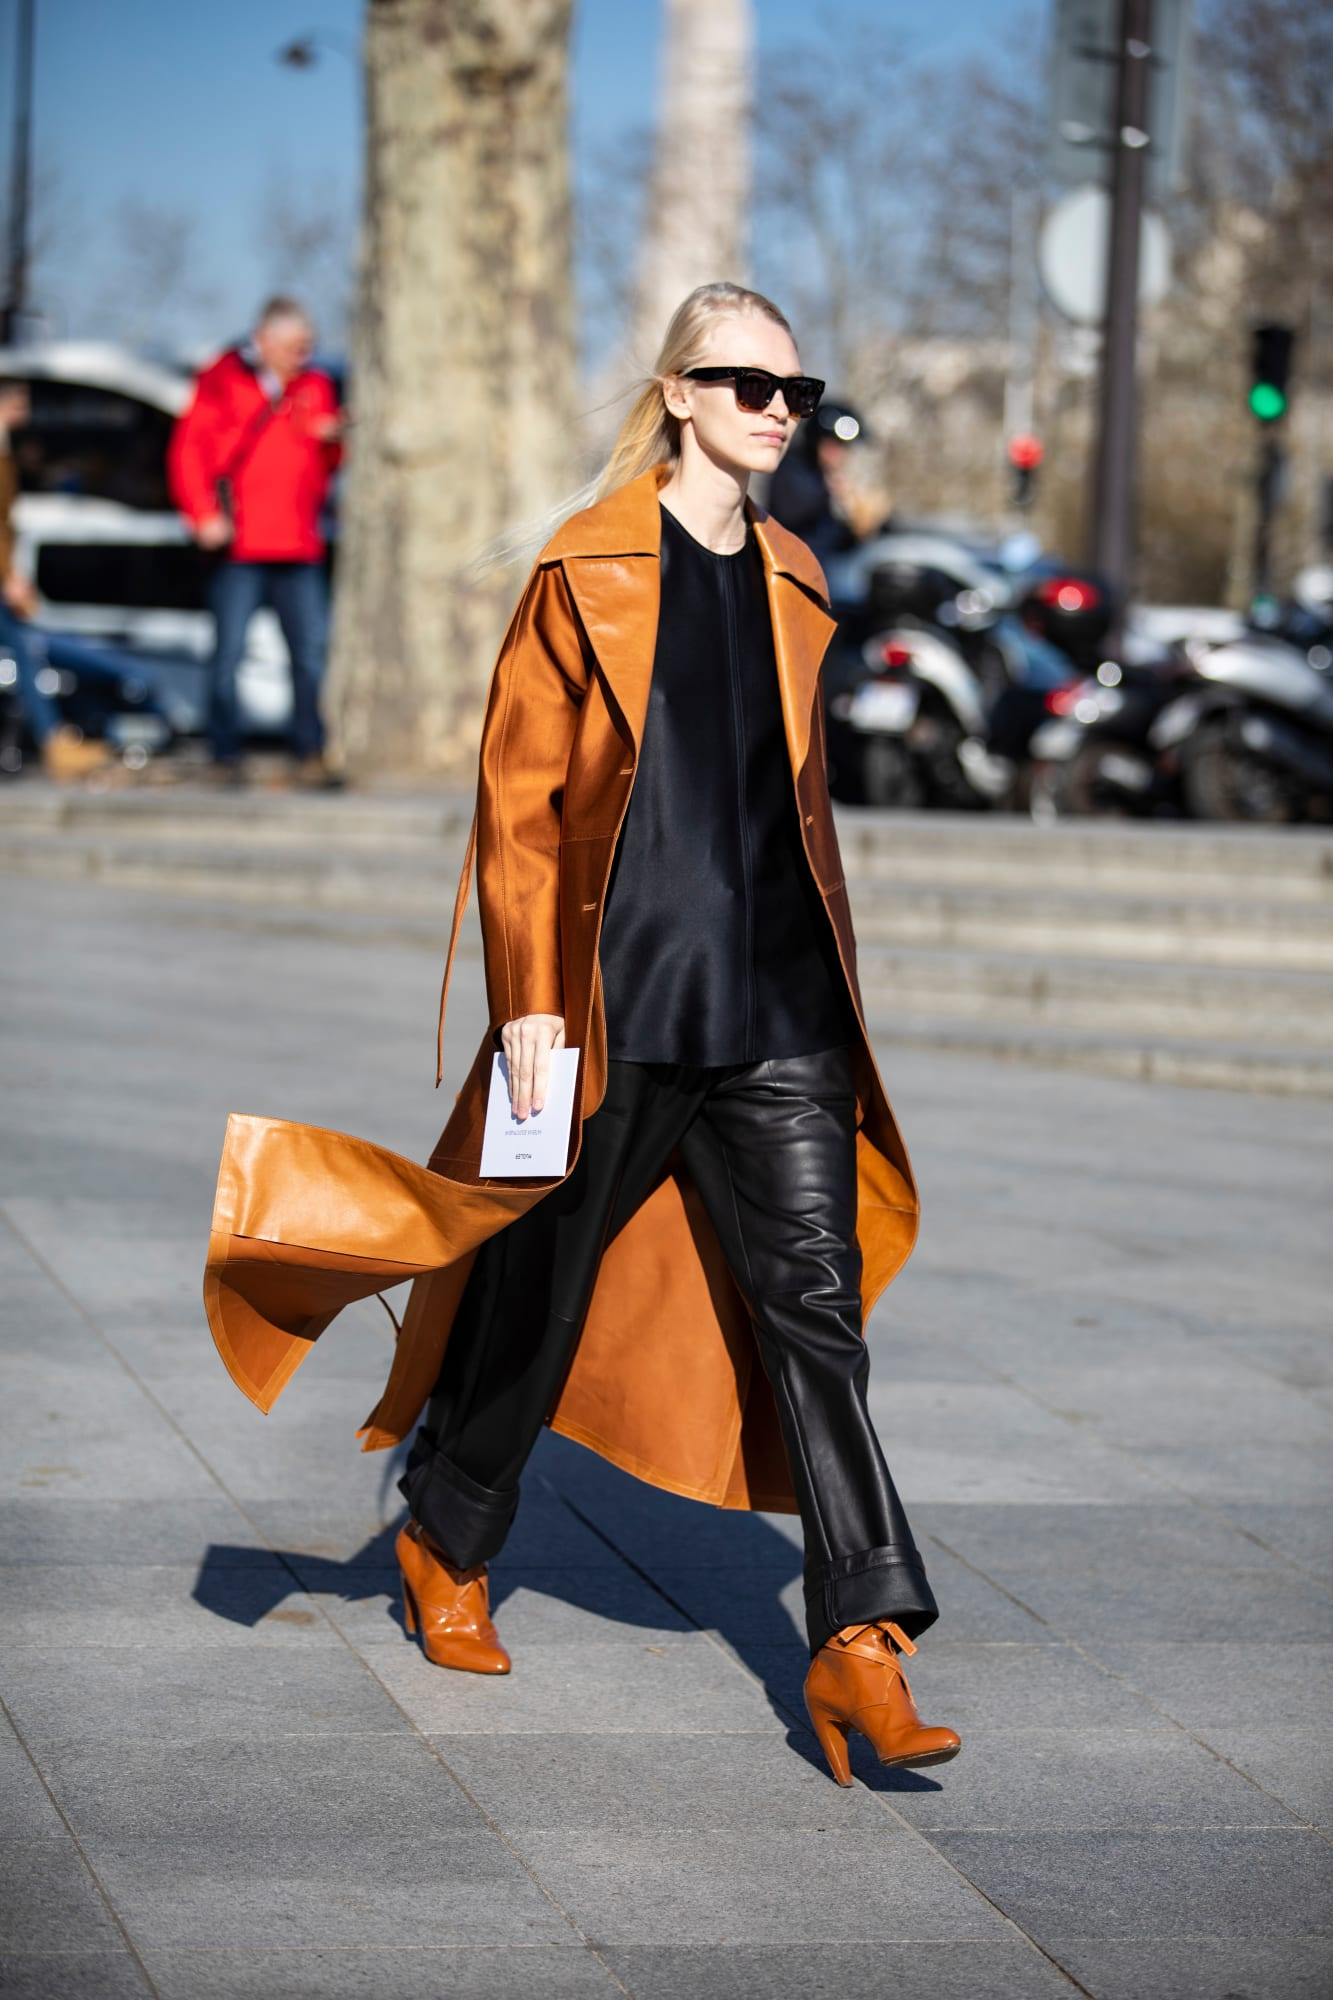 paris-fashion-week-fall-2019-street-style-day-2-3